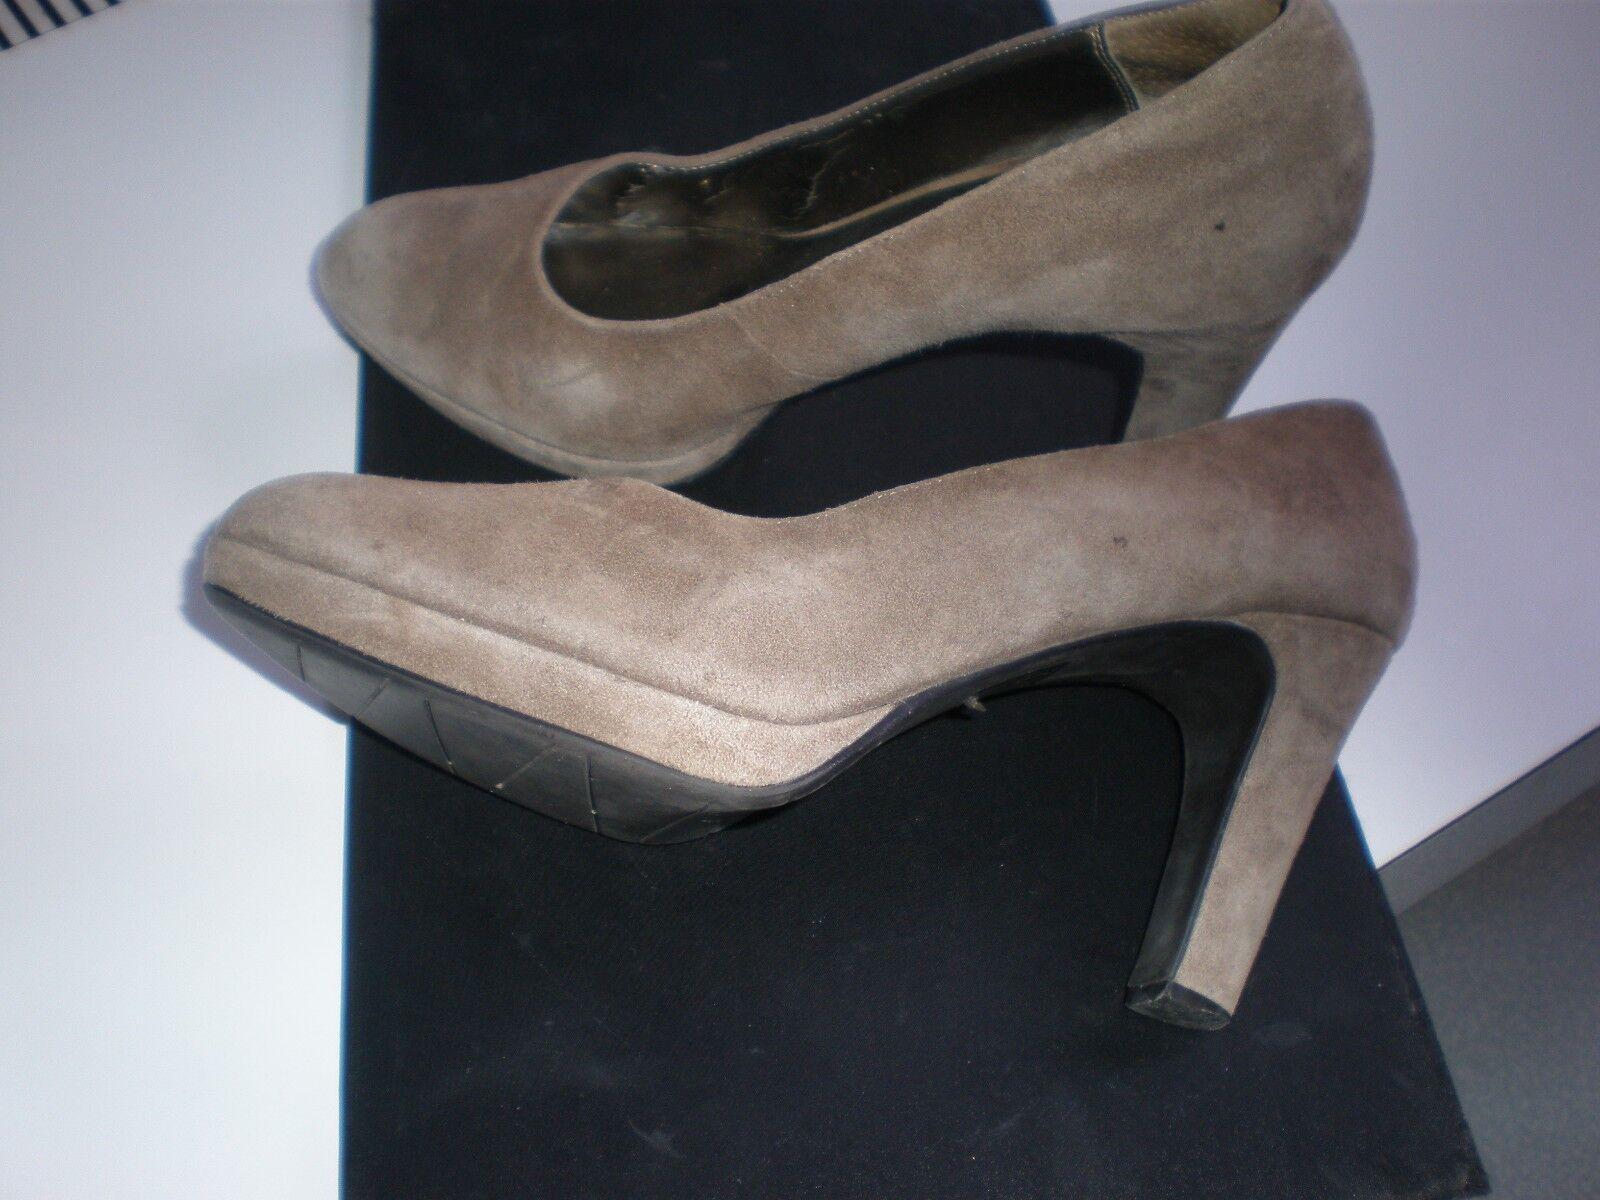 MODA SPANA  SHOES Women TAUPE Suede Platform High Heels Pumps shoes 8M PRISTINE